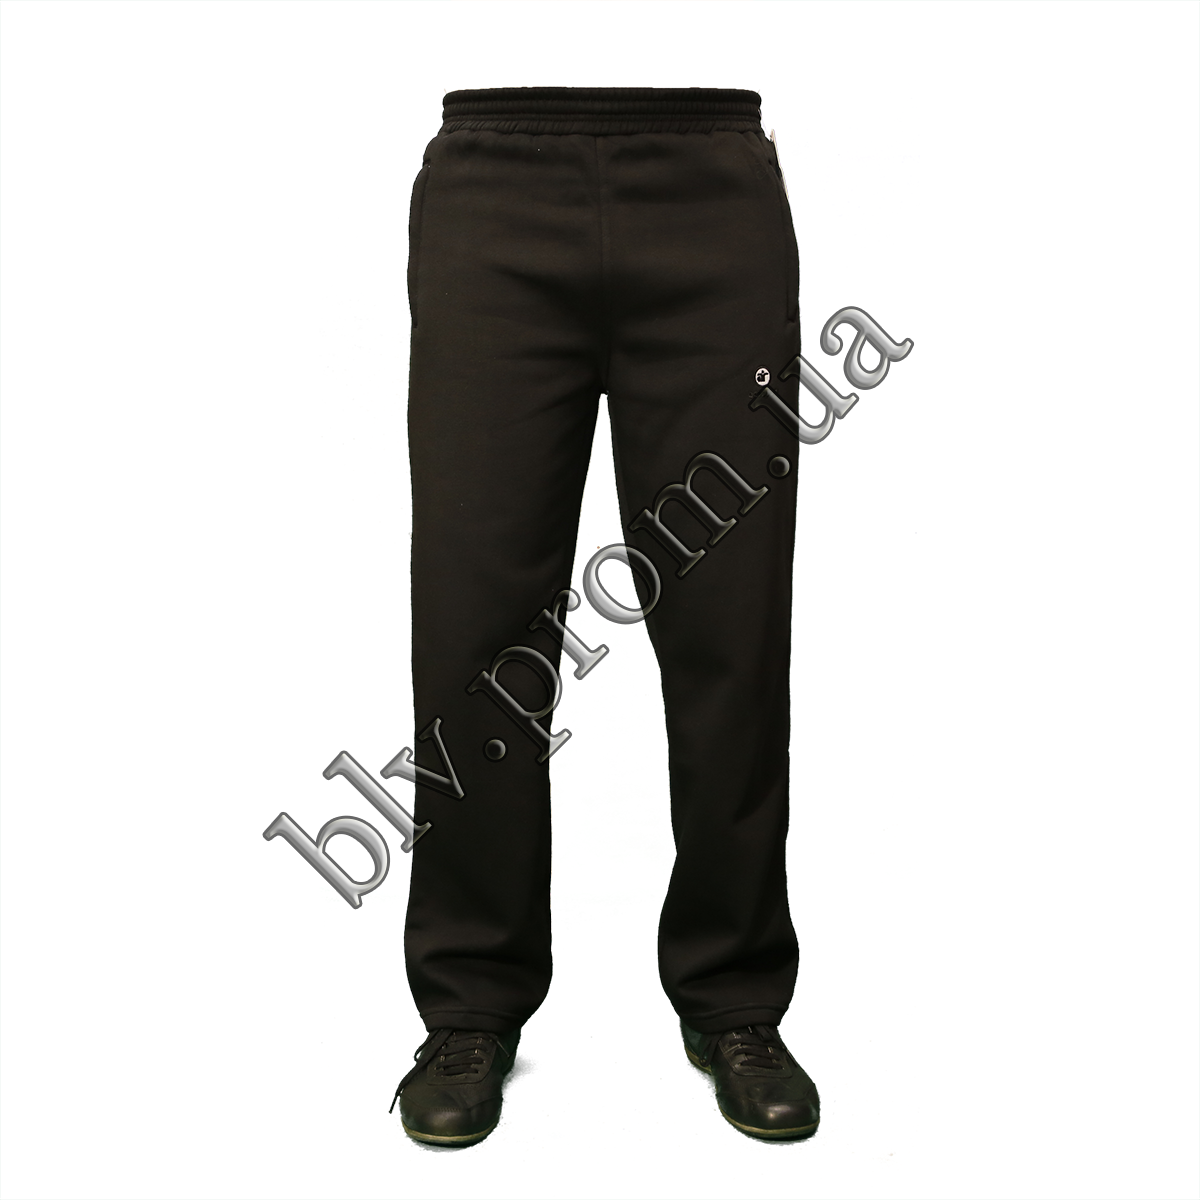 Теплые мужские брюки байка KD314 Black